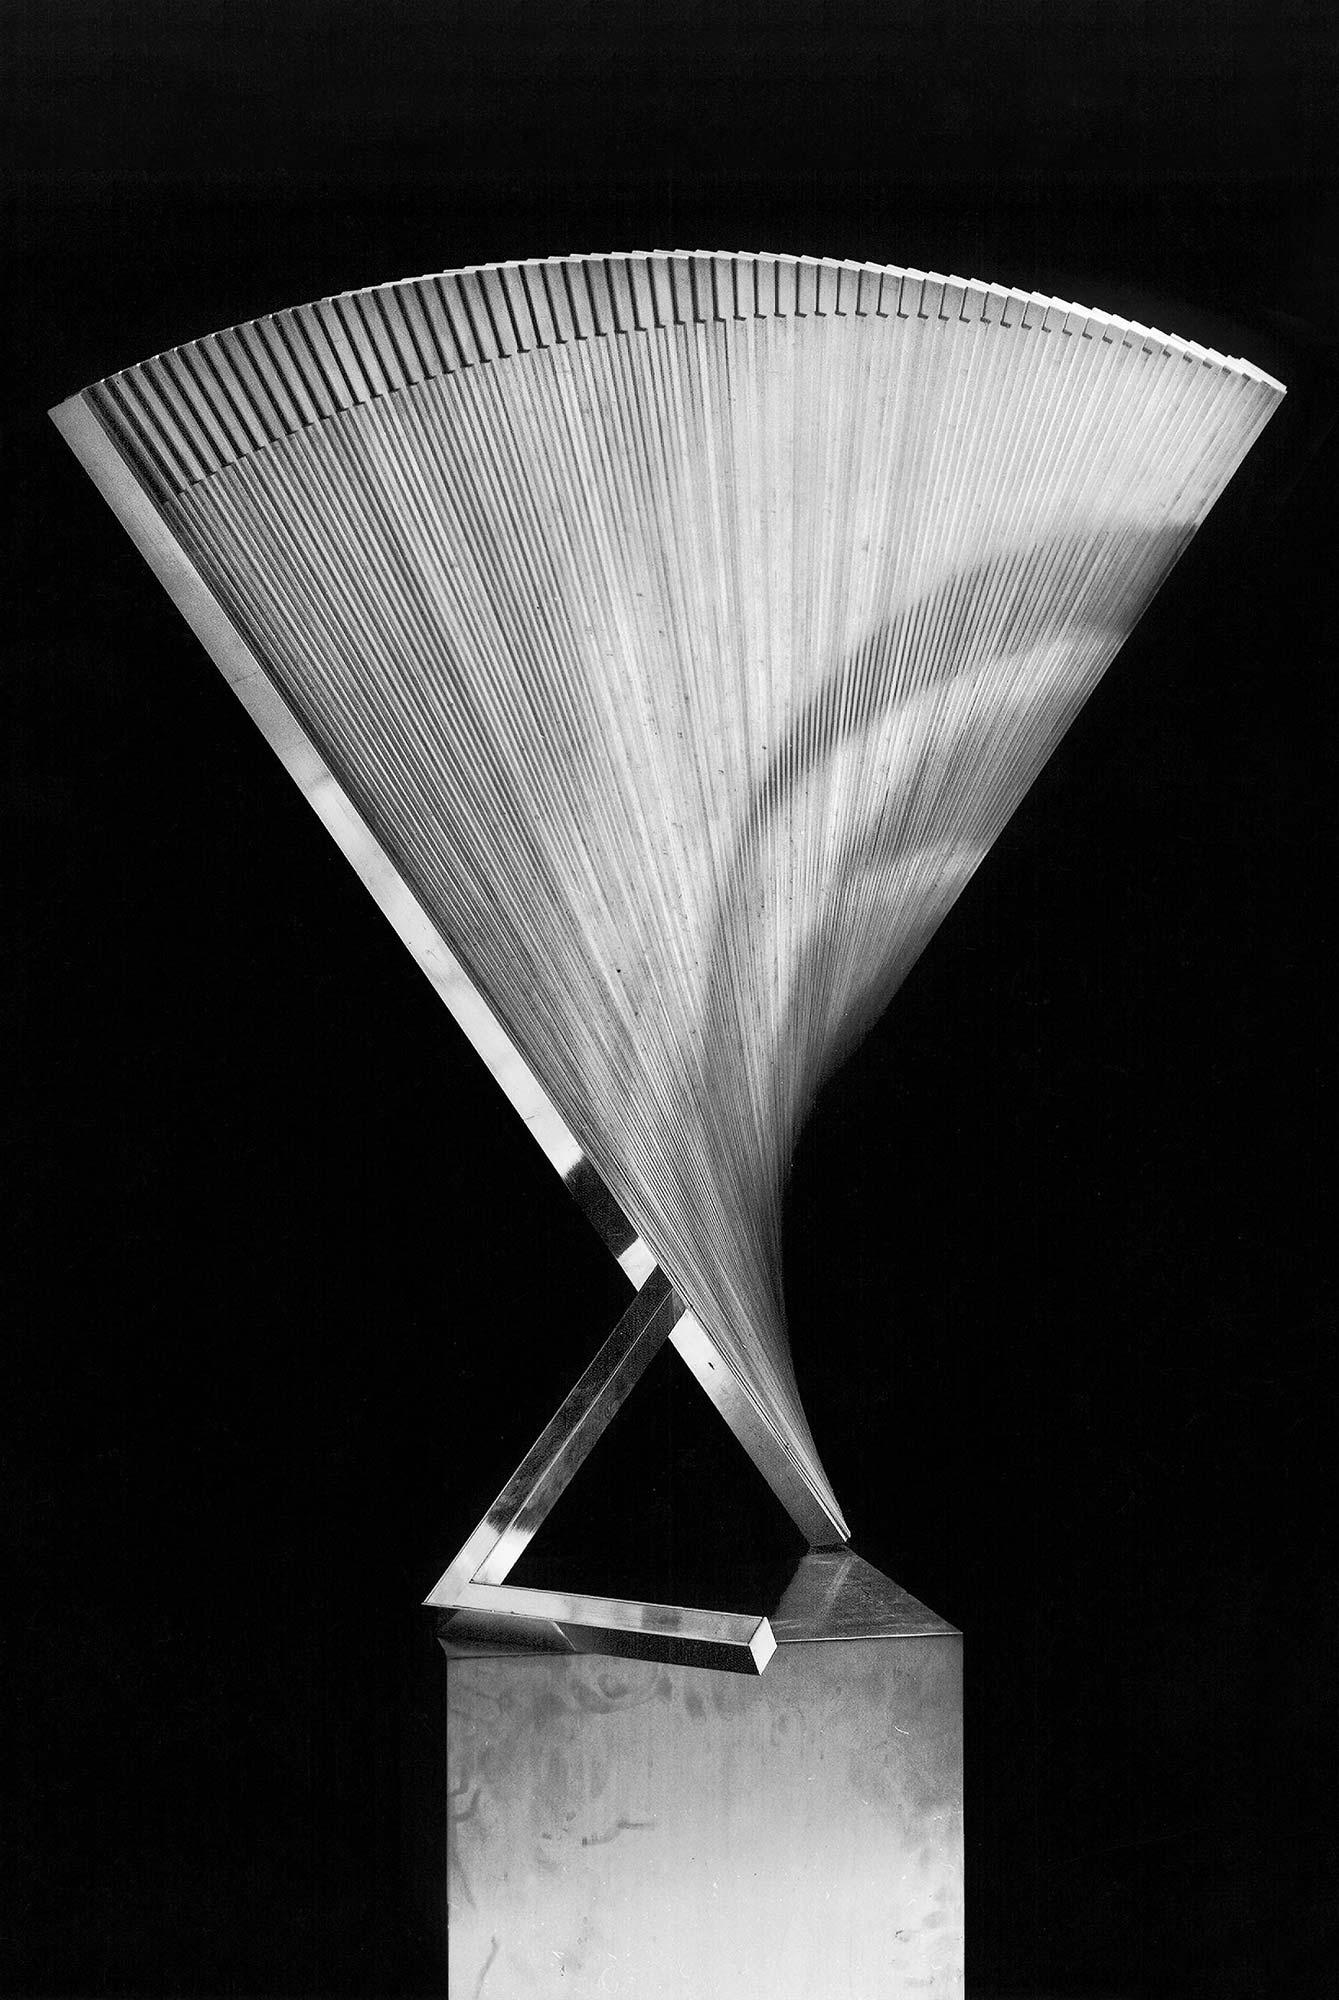 teokset-like-a-fan-anodised-aluminium-1979